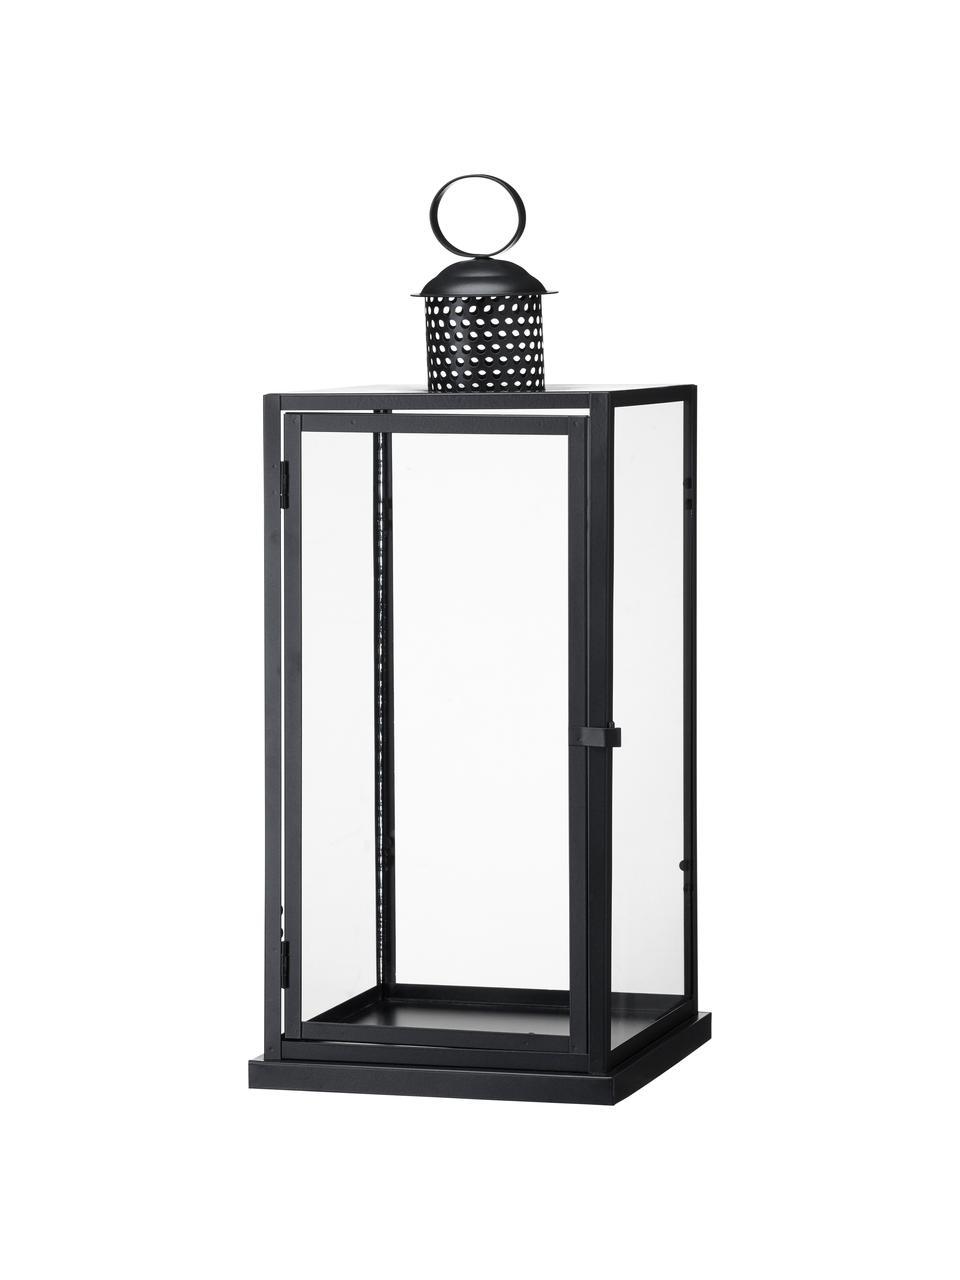 Komplet latarenek Galea, 2 elem., Stelaż: metal powlekany, Czarny, Komplet z różnymi rozmiarami